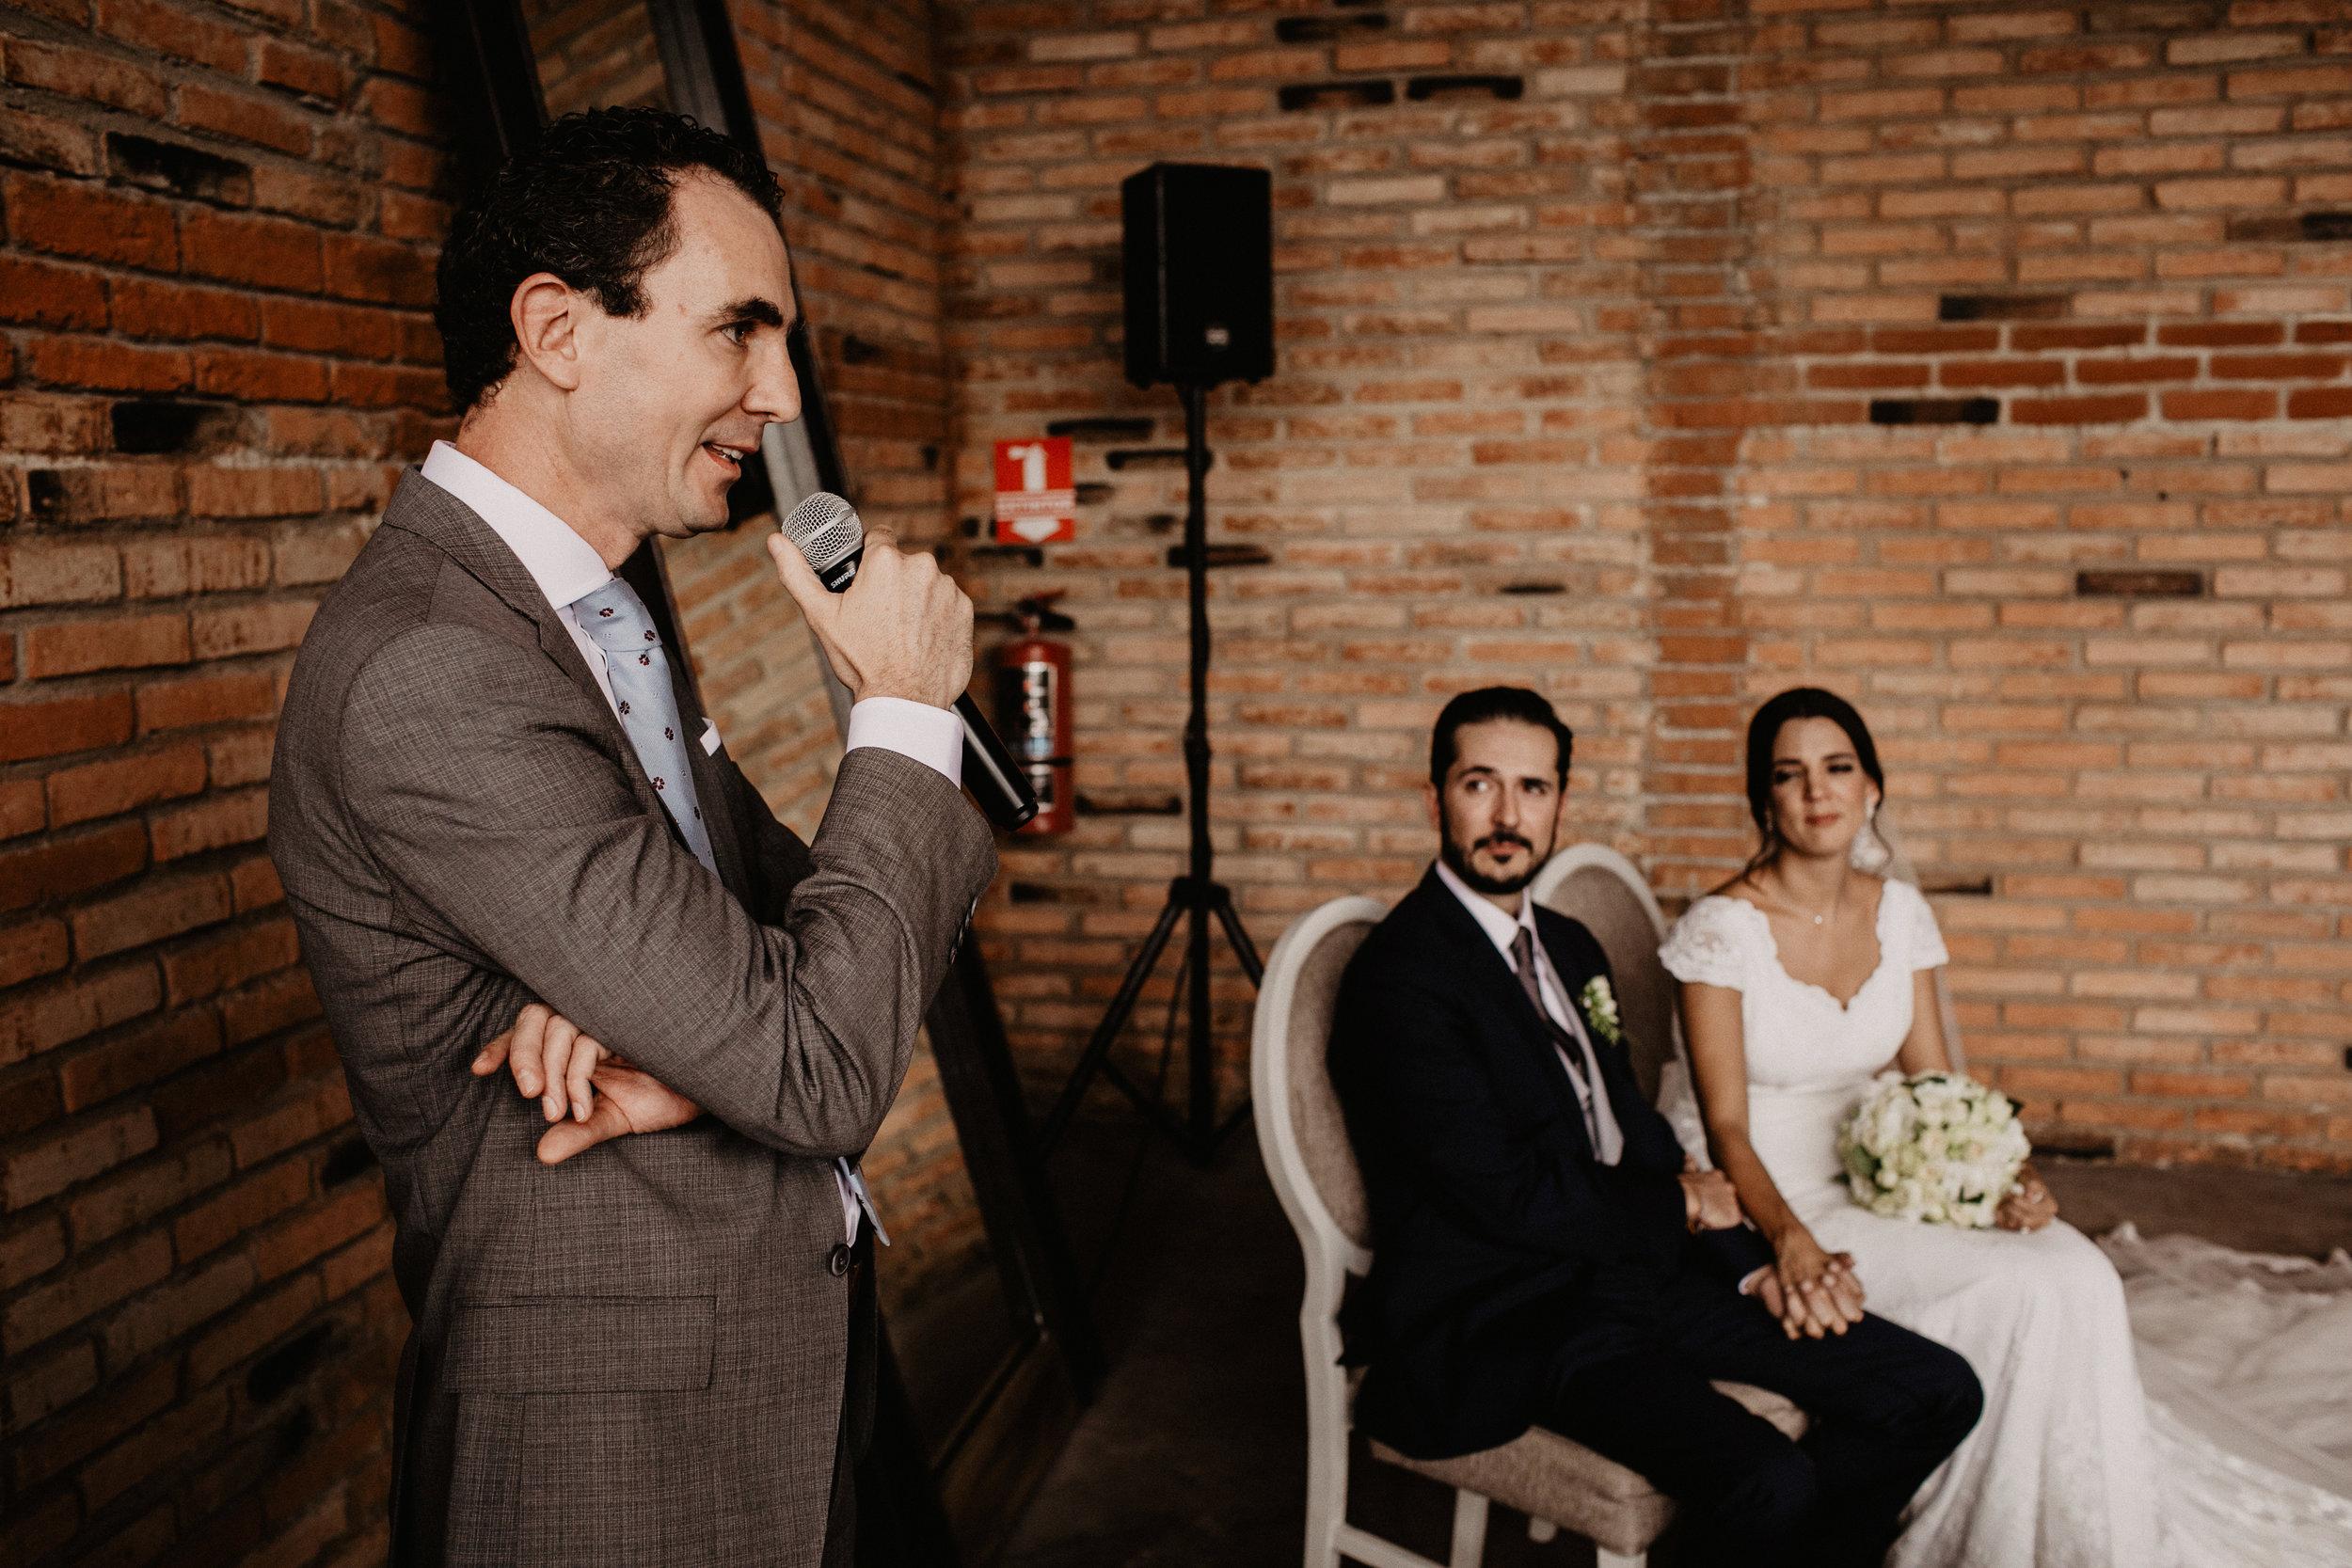 alfonso_flores_destination_wedding_photographer_pau_alonso_419.JPG